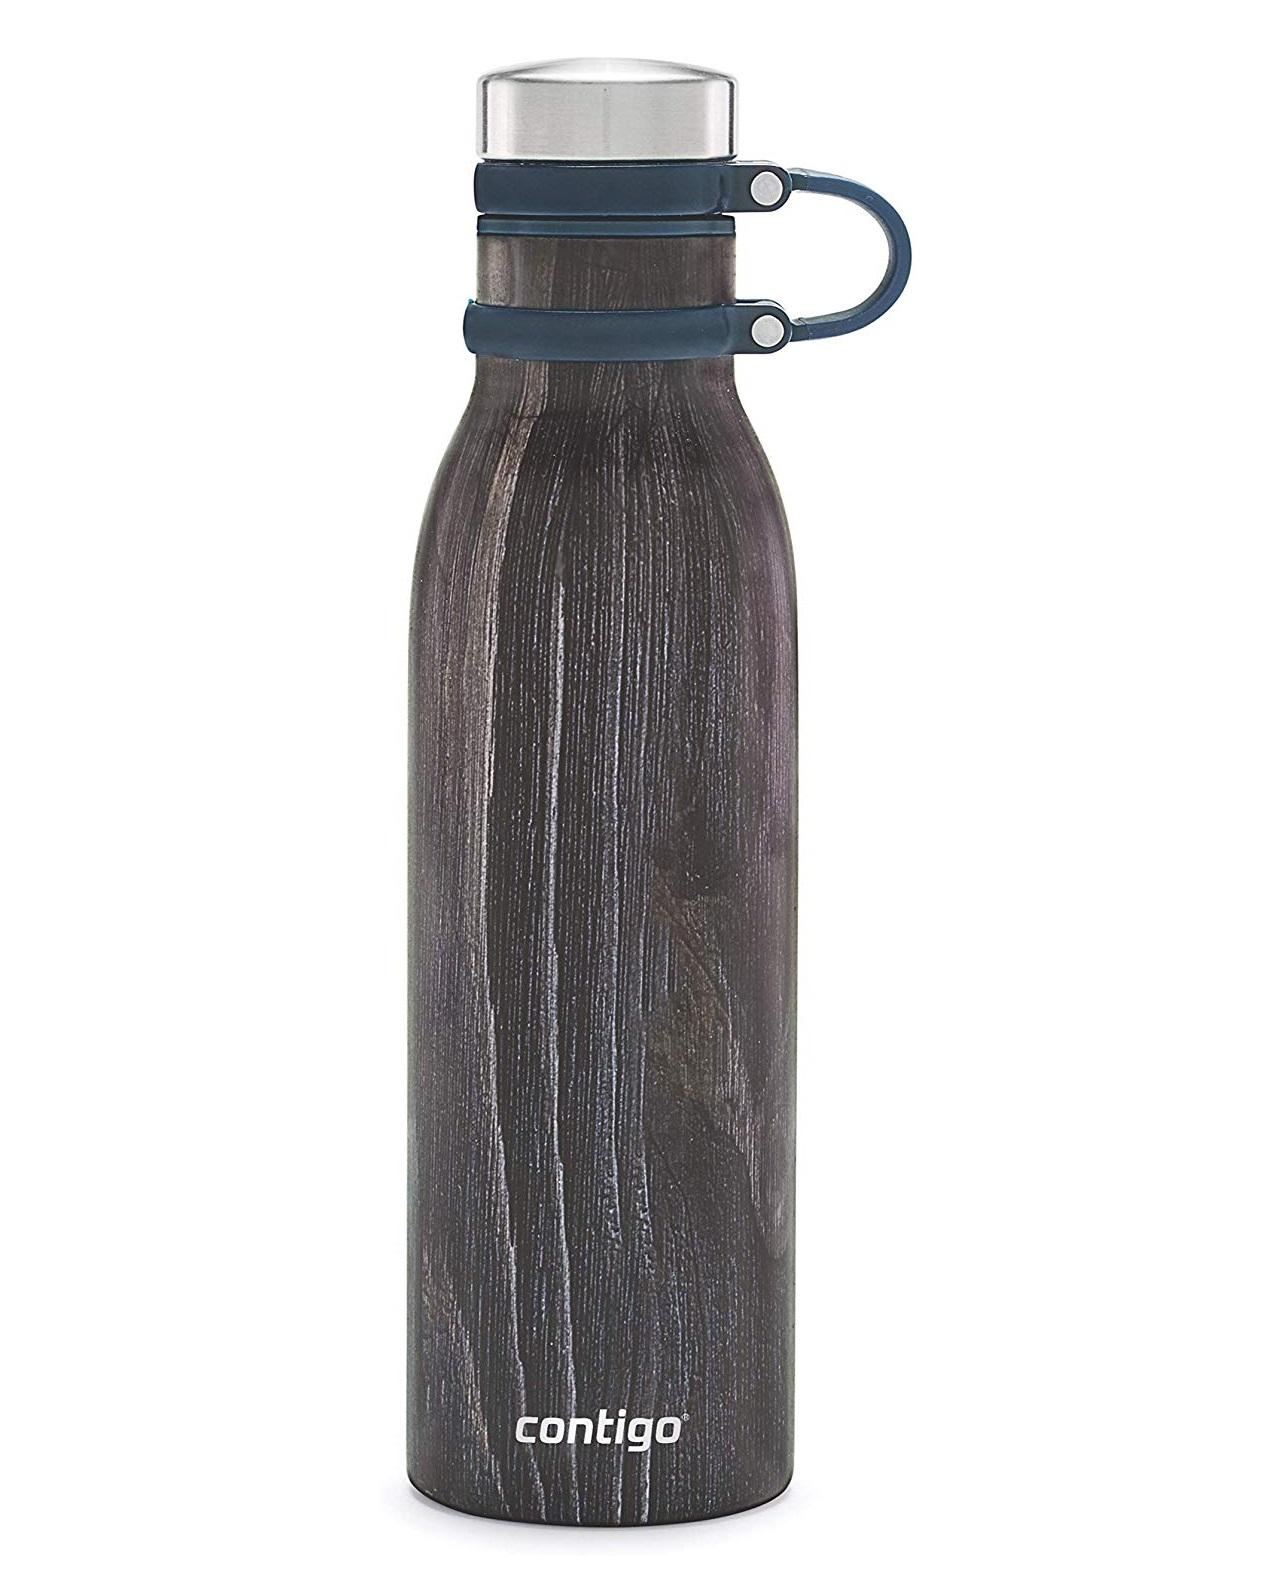 Онлайн каталог PROMENU: Термобутылка Contigo MATTERHORNE COUTURE Indigo Wood, объем 0,59 л, темное дерево Contigo 2104550